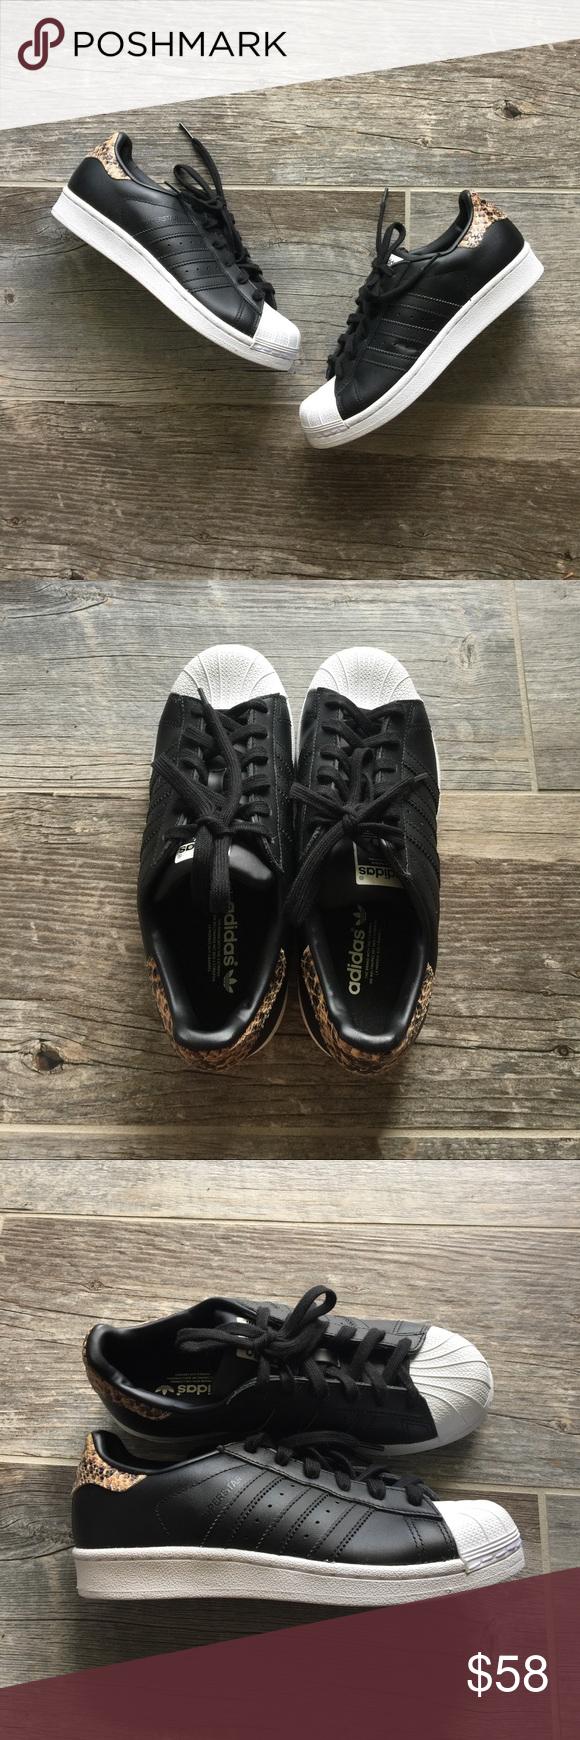 black adidas shoes size 6